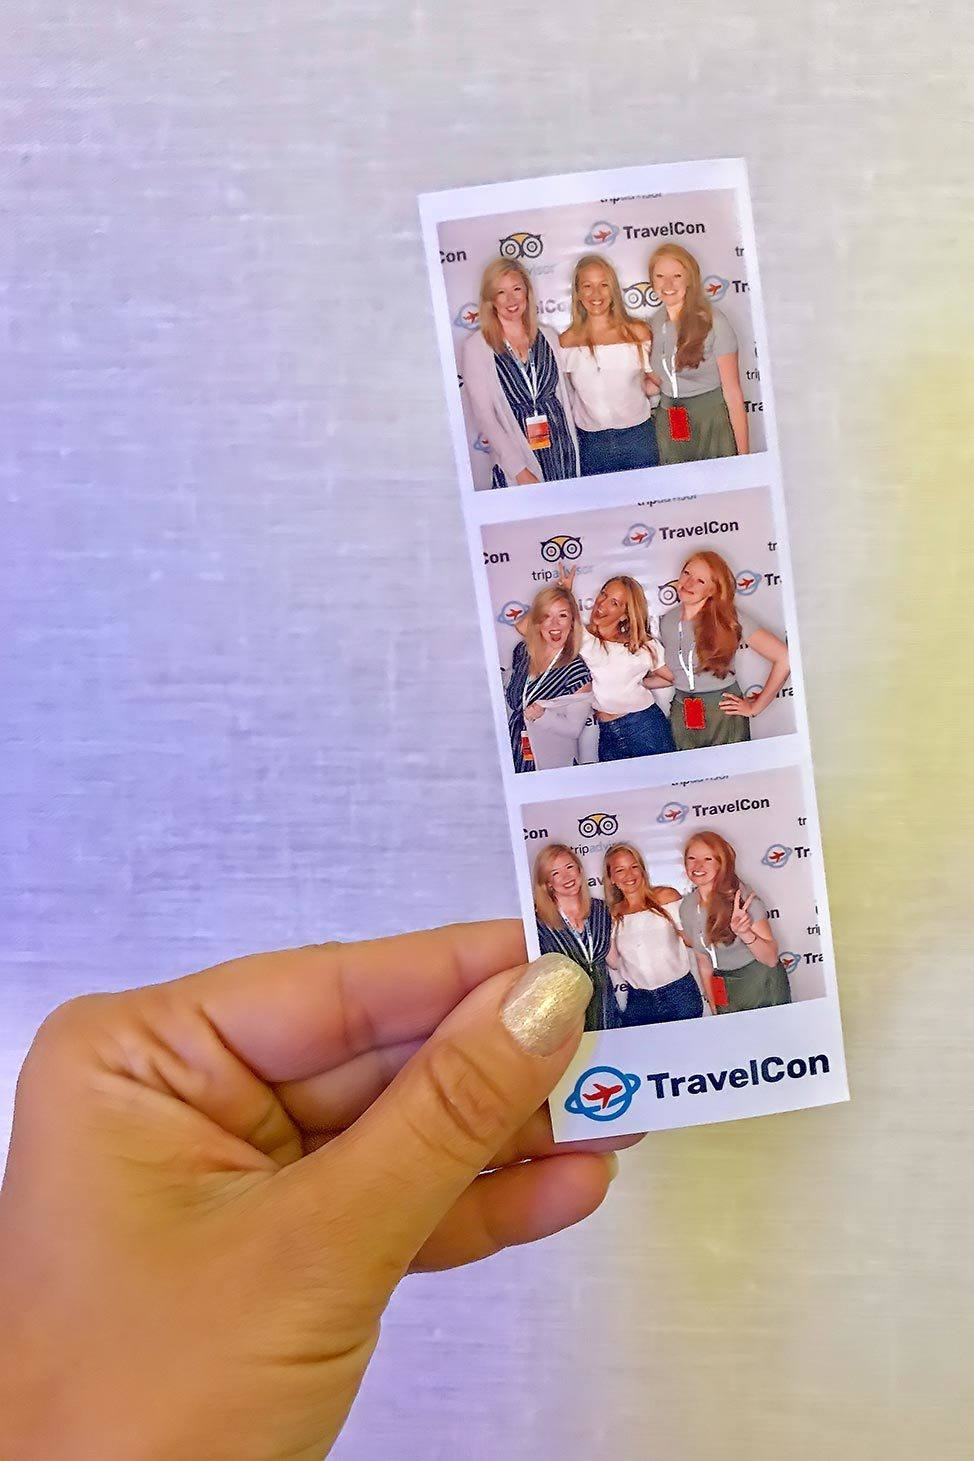 TravelCon 2019 in Boston